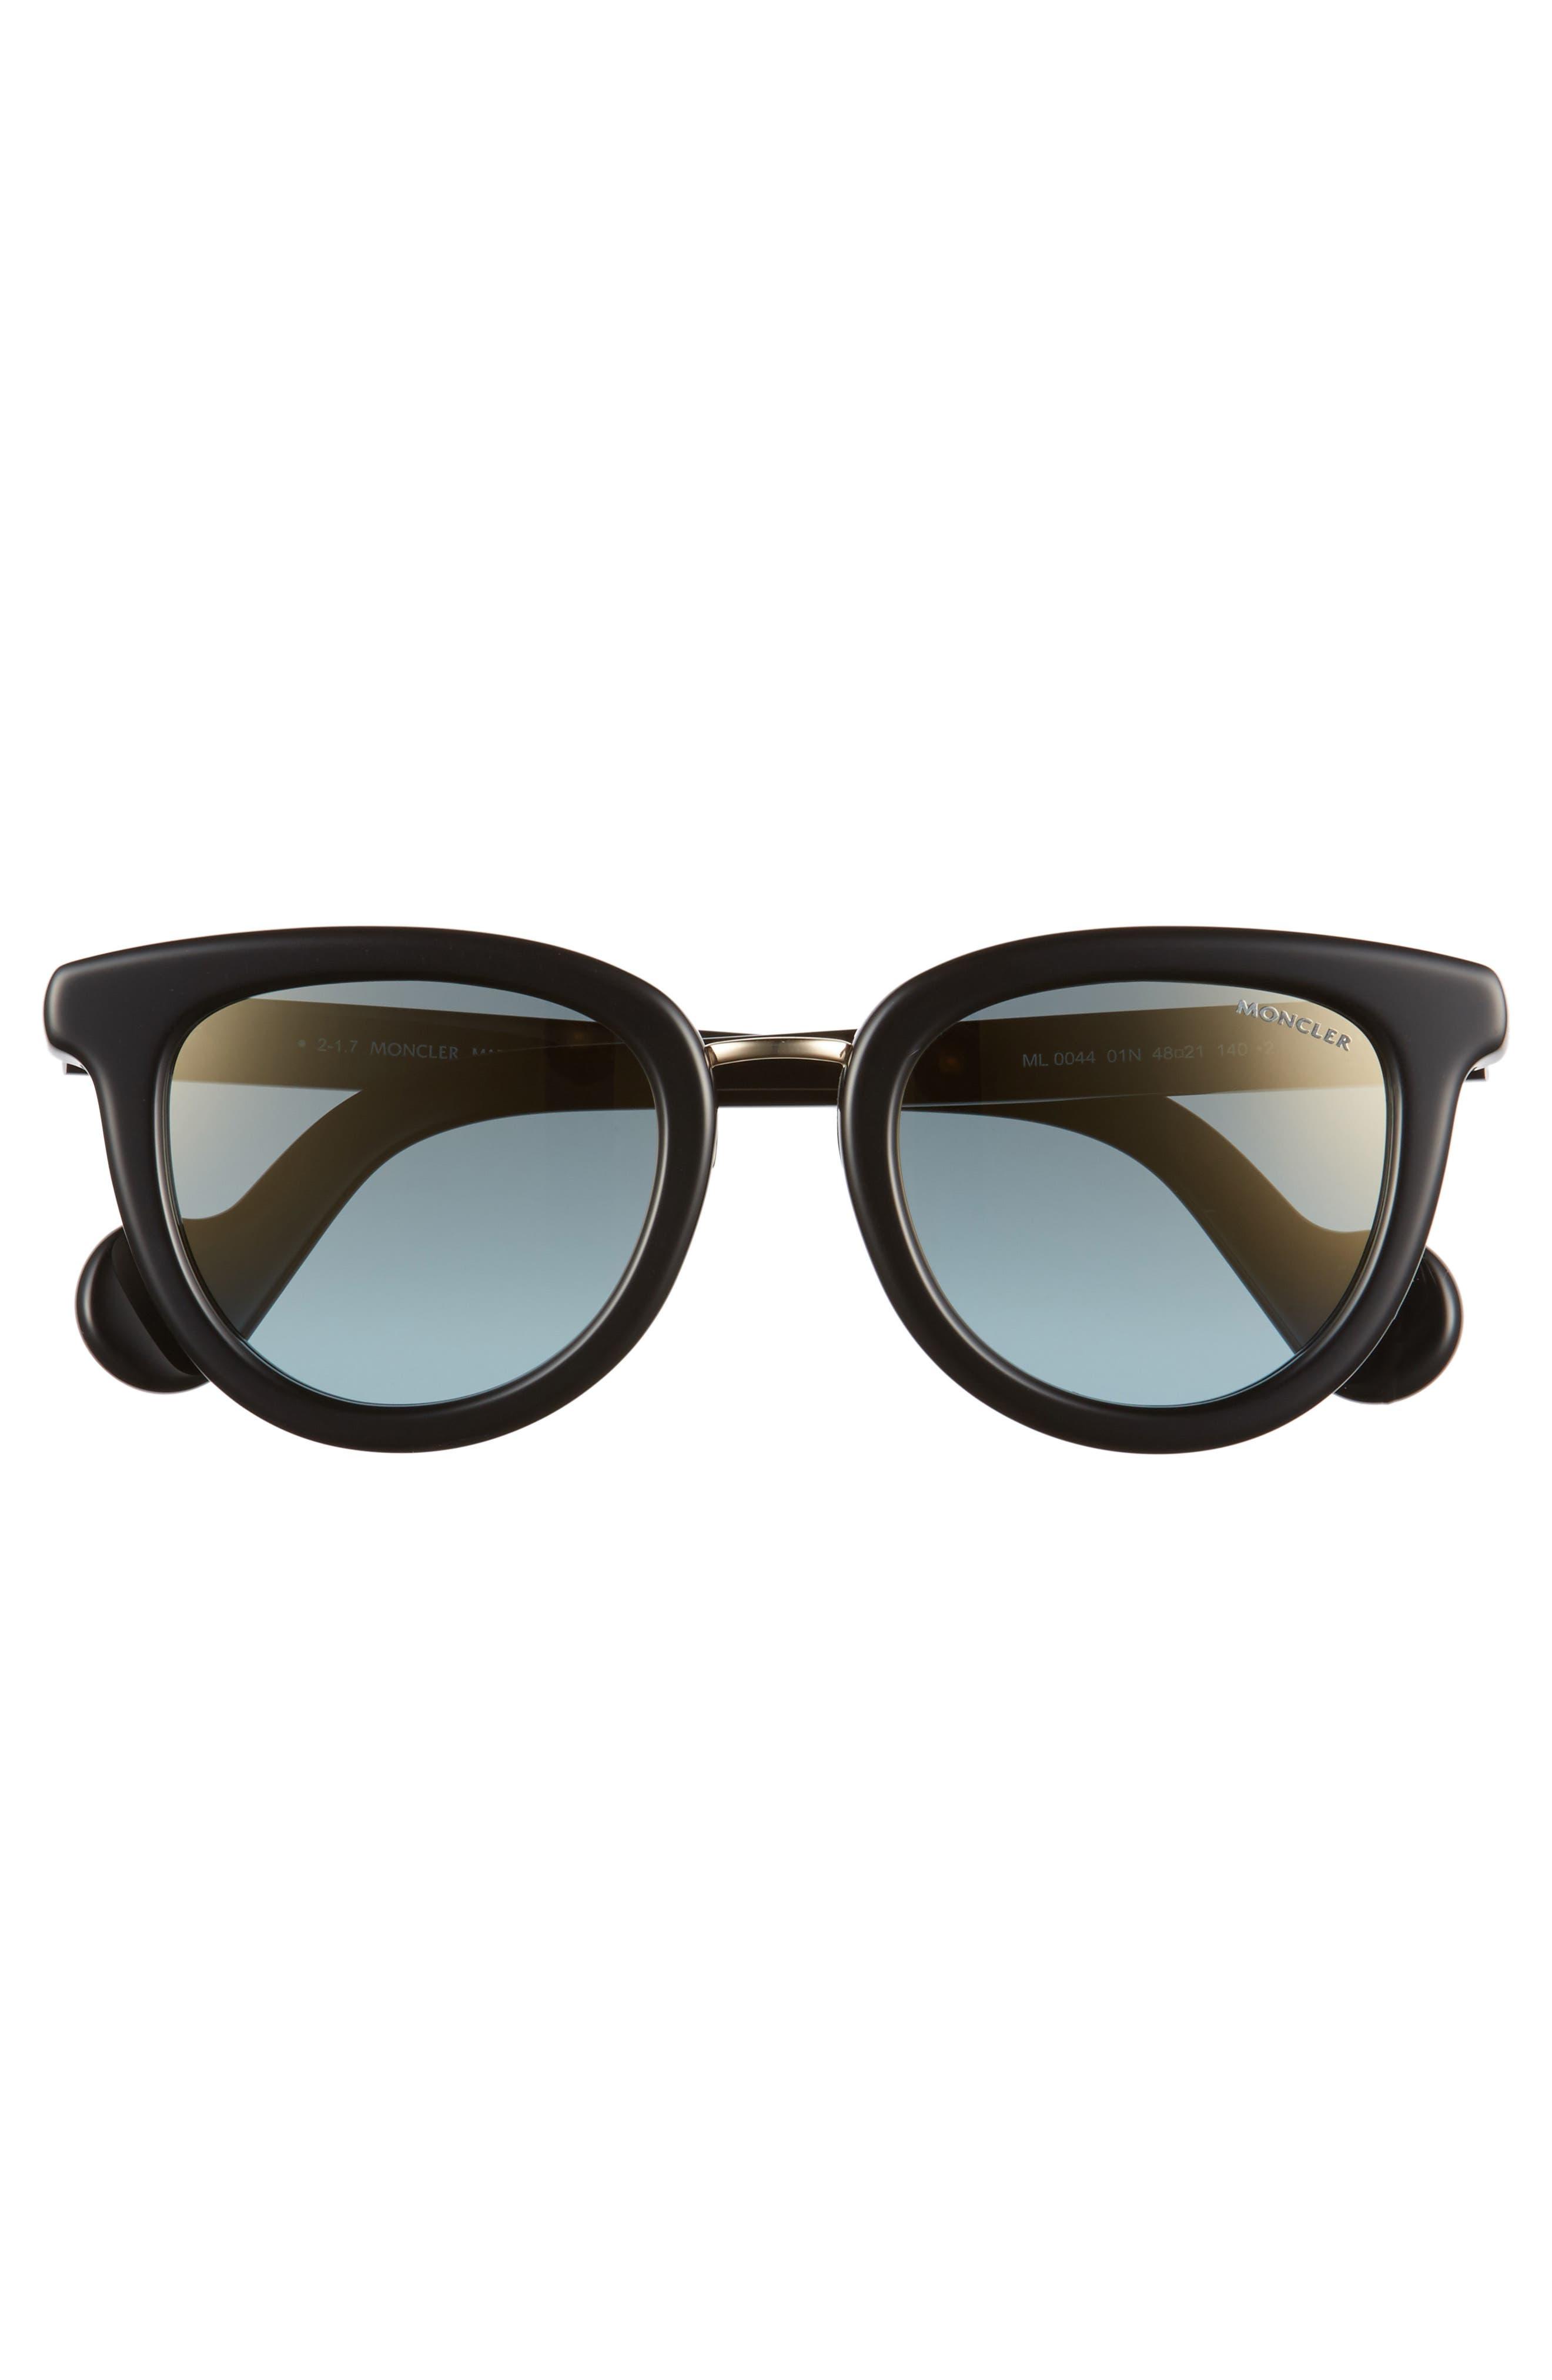 48mm Cat Eye Sunglasses,                             Alternate thumbnail 3, color,                             BLACK/ PALE GOLD/ LIGHT BLUE